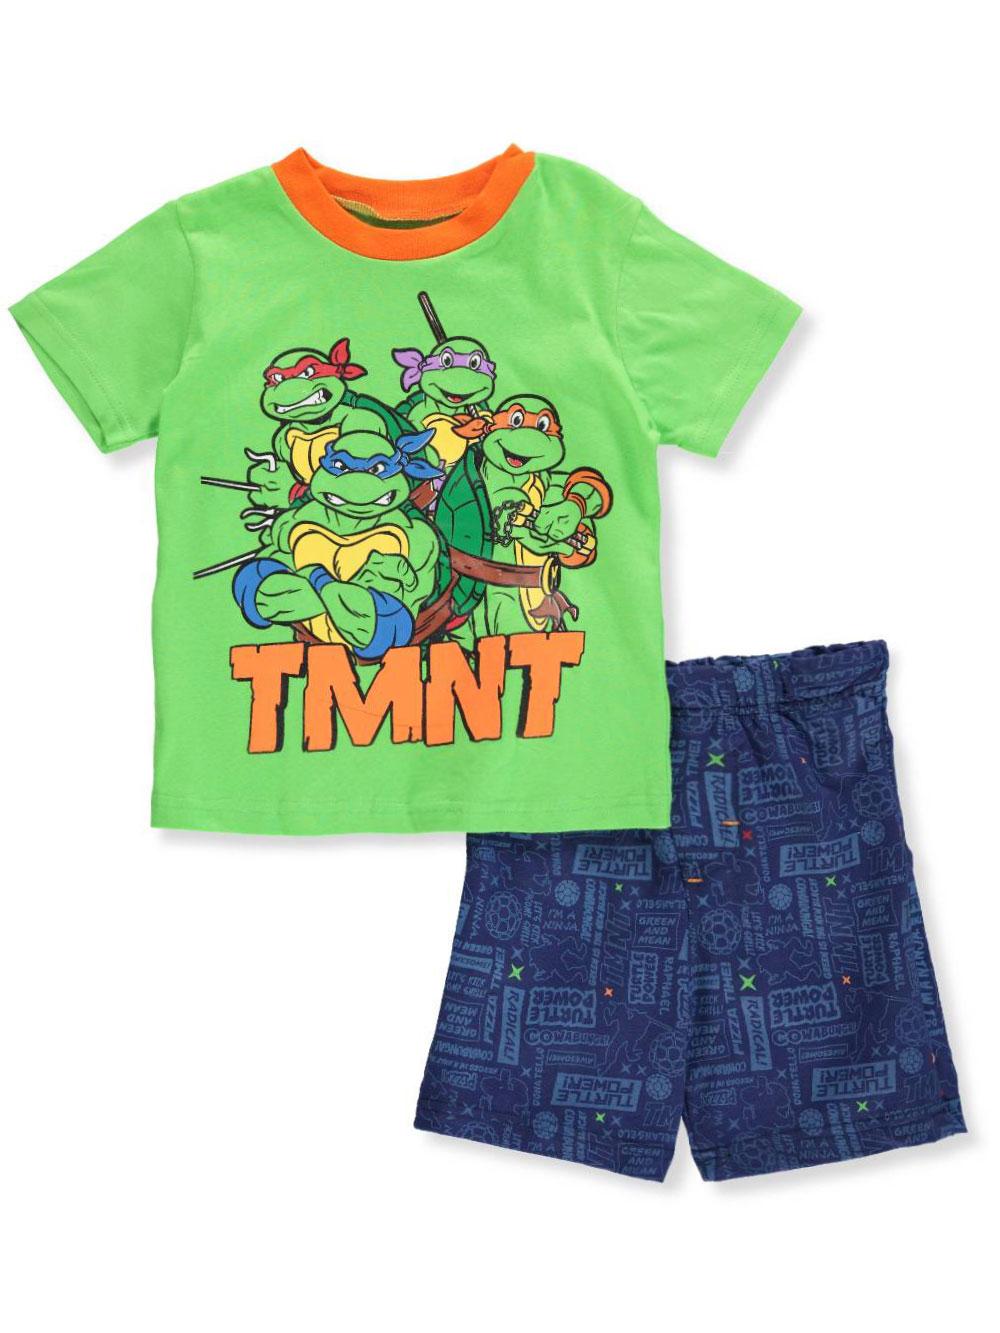 TMNT Boys' 2-Piece Shorts Set Outfit